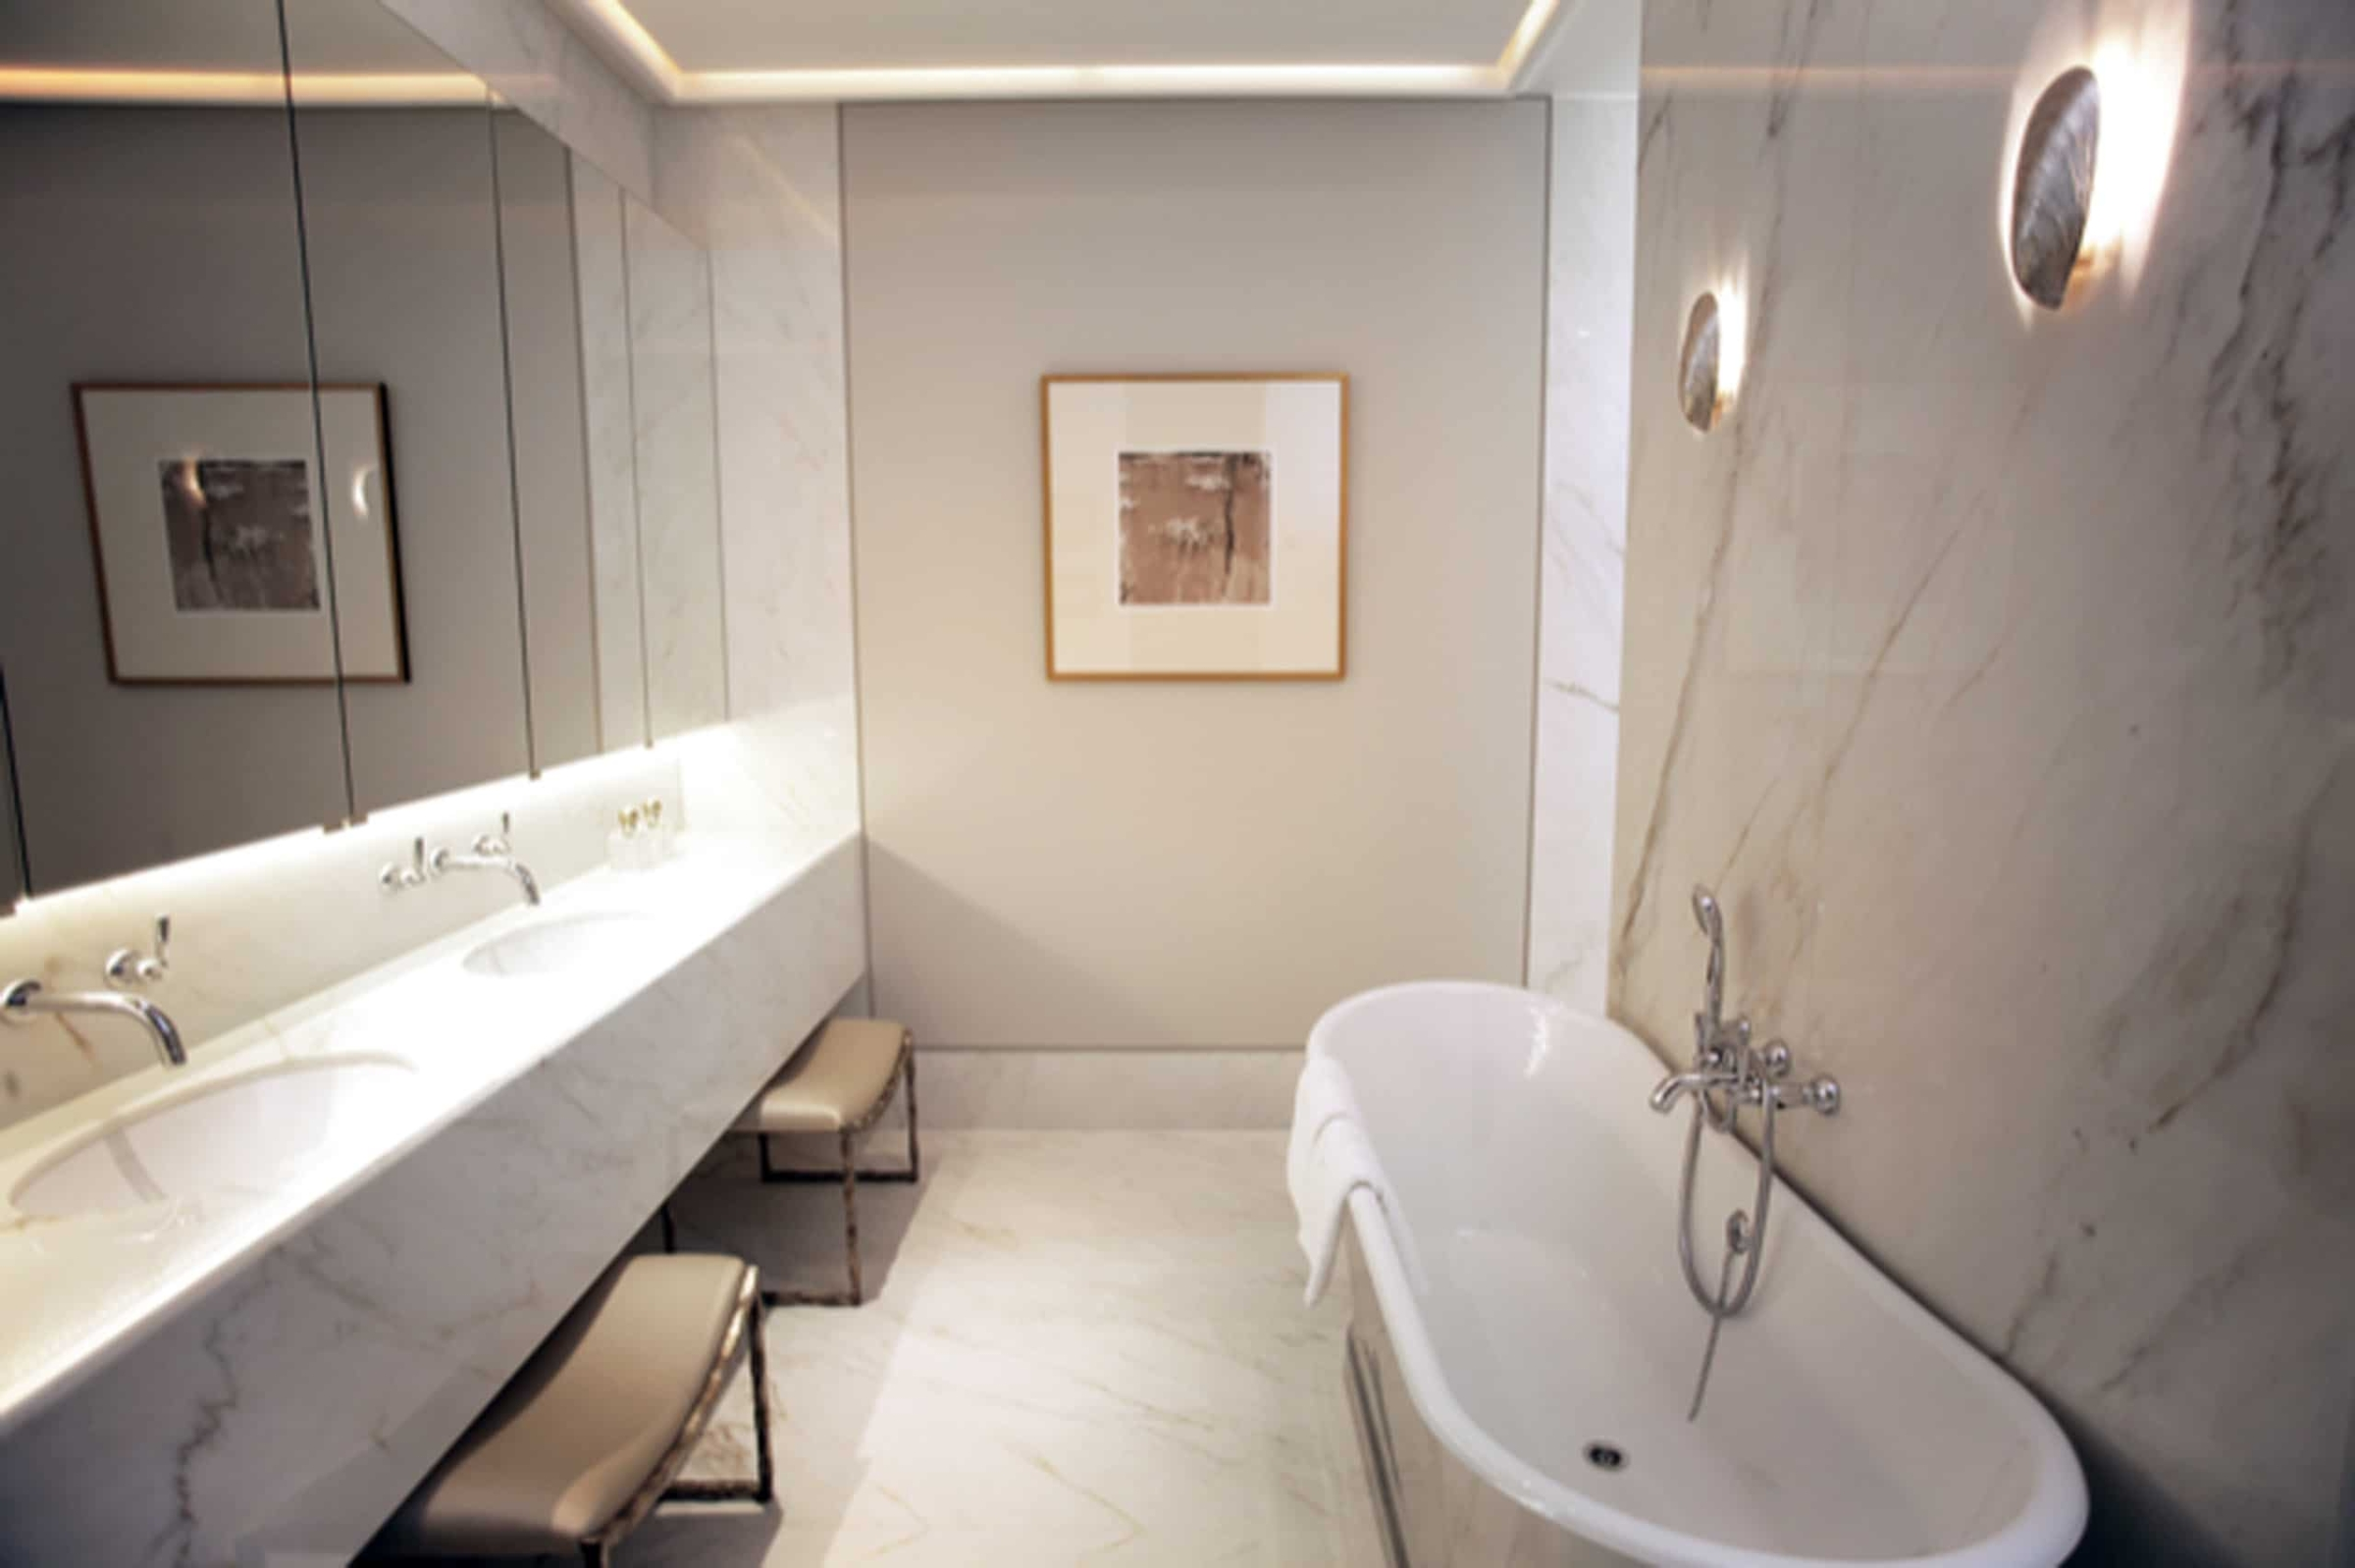 Calacatta Crema Marble Cream Bathroom Wall Cladding Vanity Top Undermounted Sink London